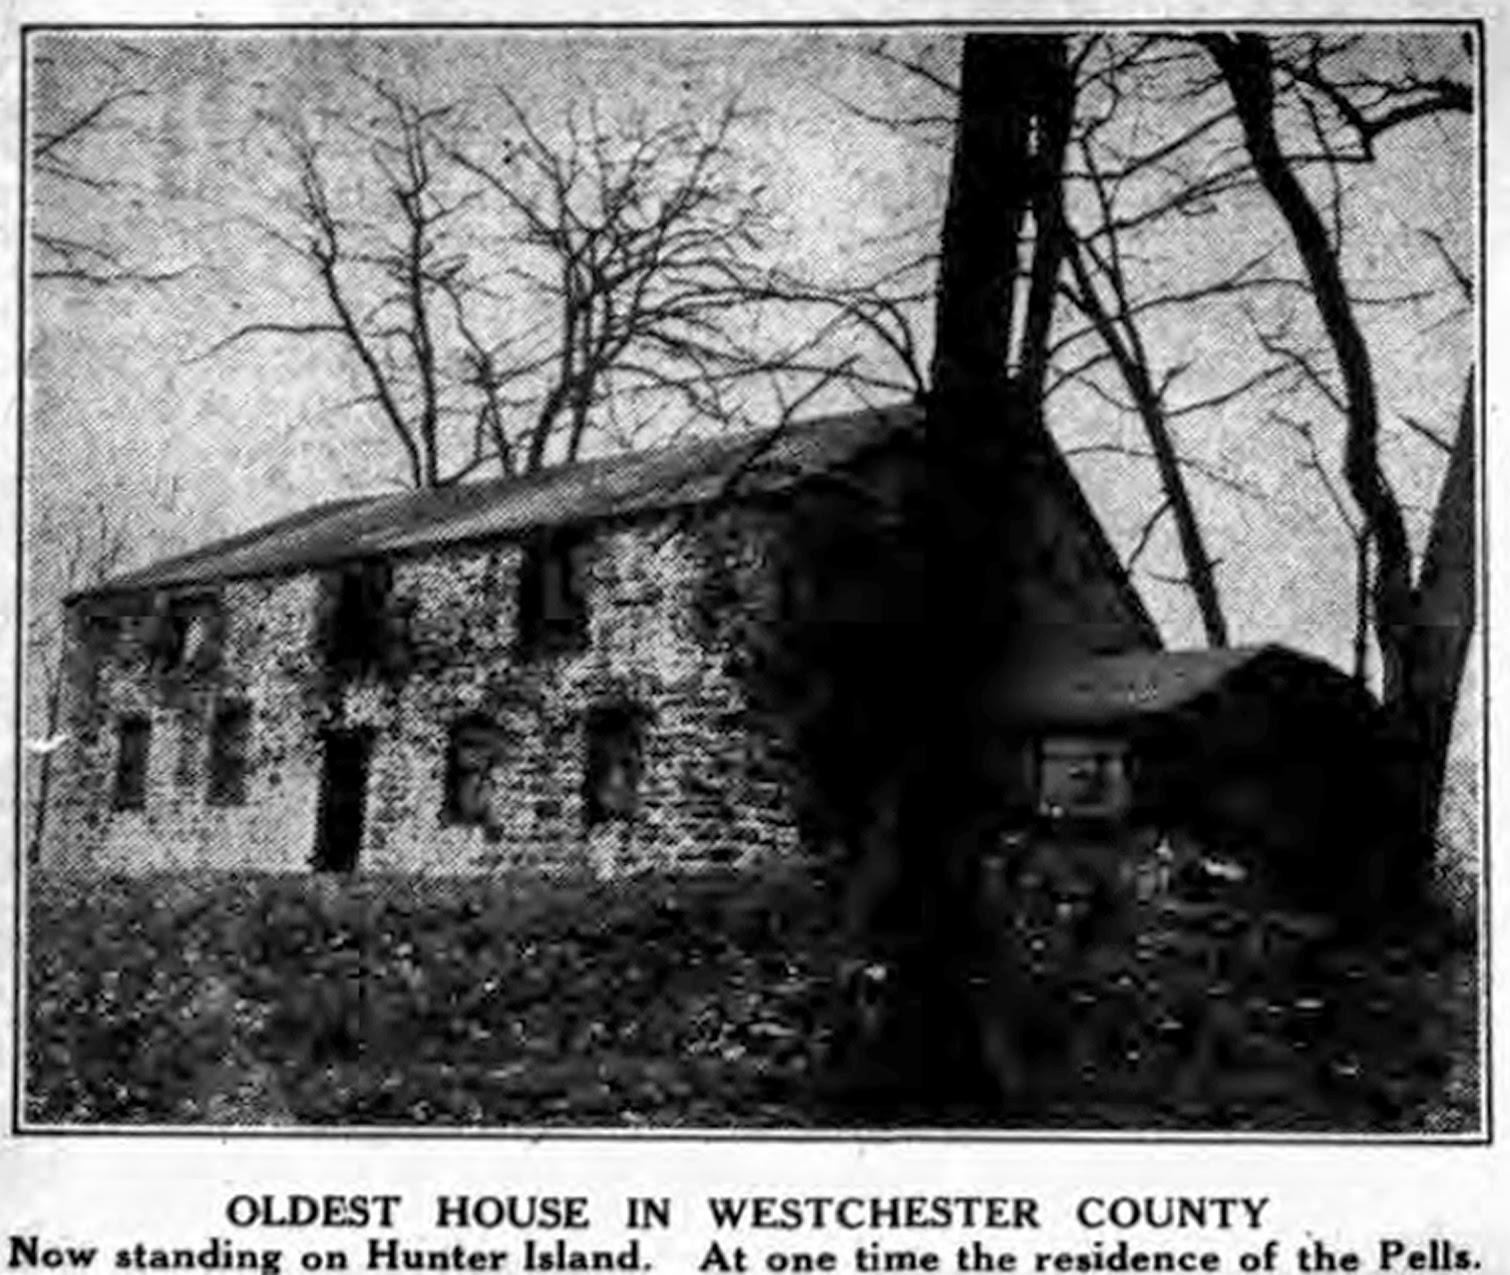 Historic Pelham: The Old Stone House That Stood On Hunter